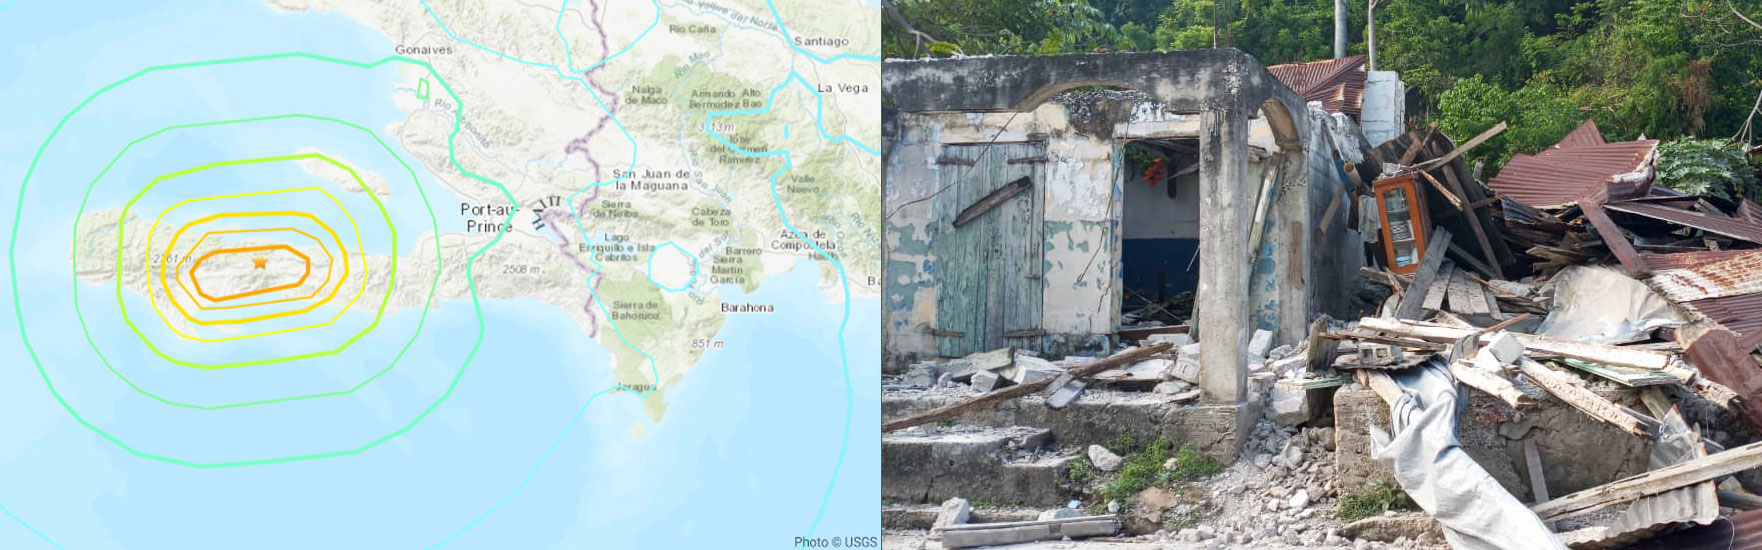 disaster-haitiearthquake-impactupdates-header-image